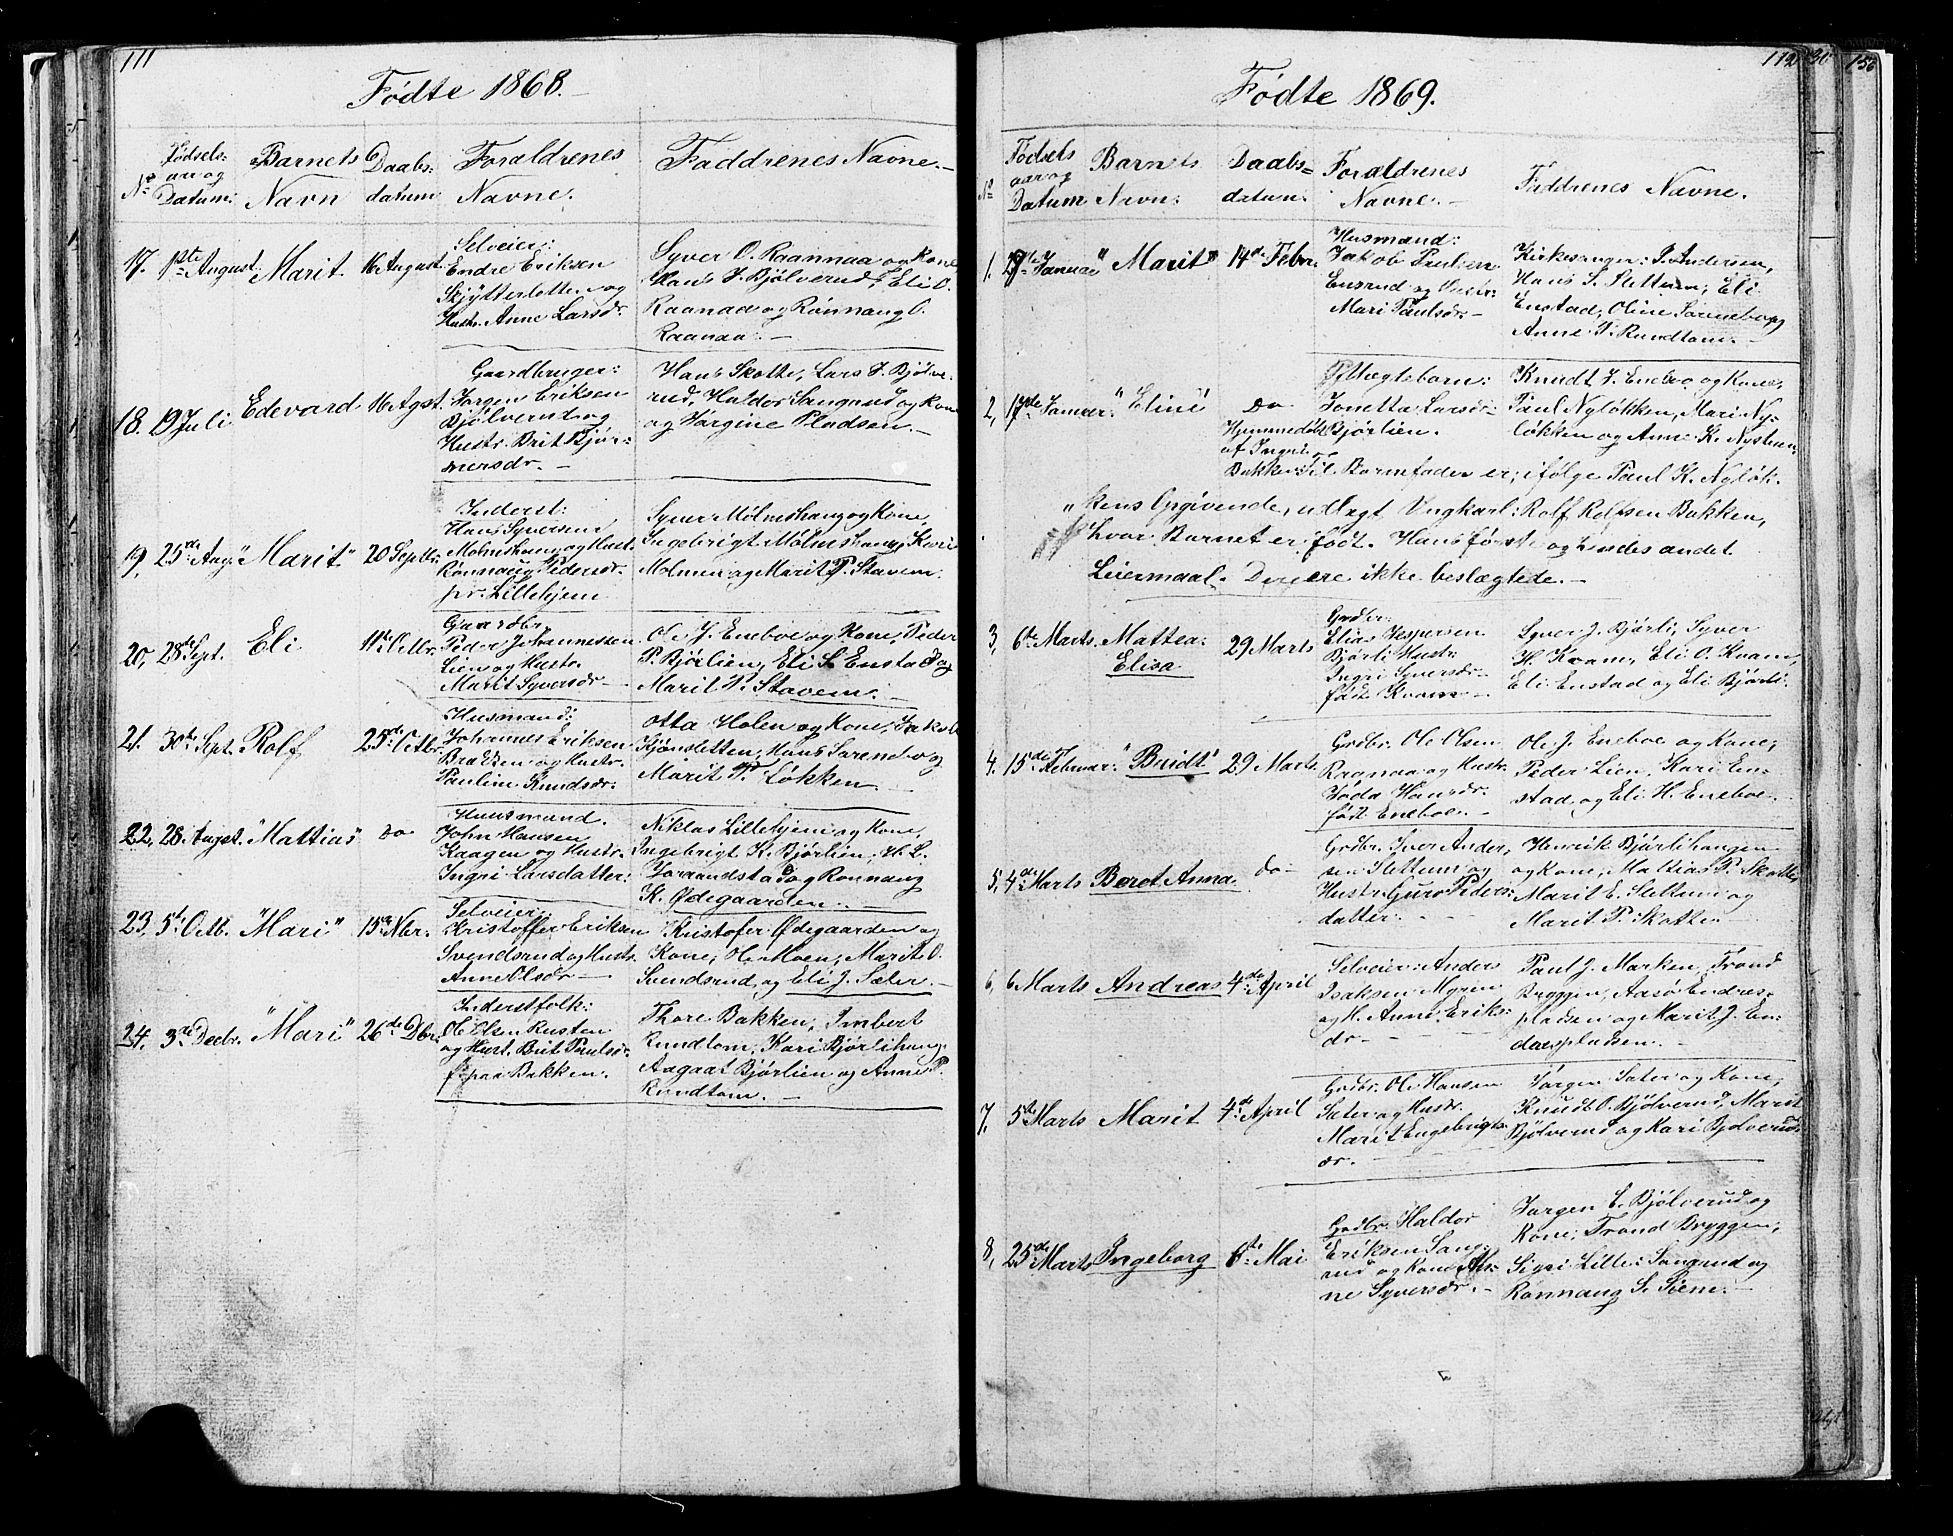 SAH, Lesja prestekontor, Klokkerbok nr. 4, 1842-1871, s. 111-112